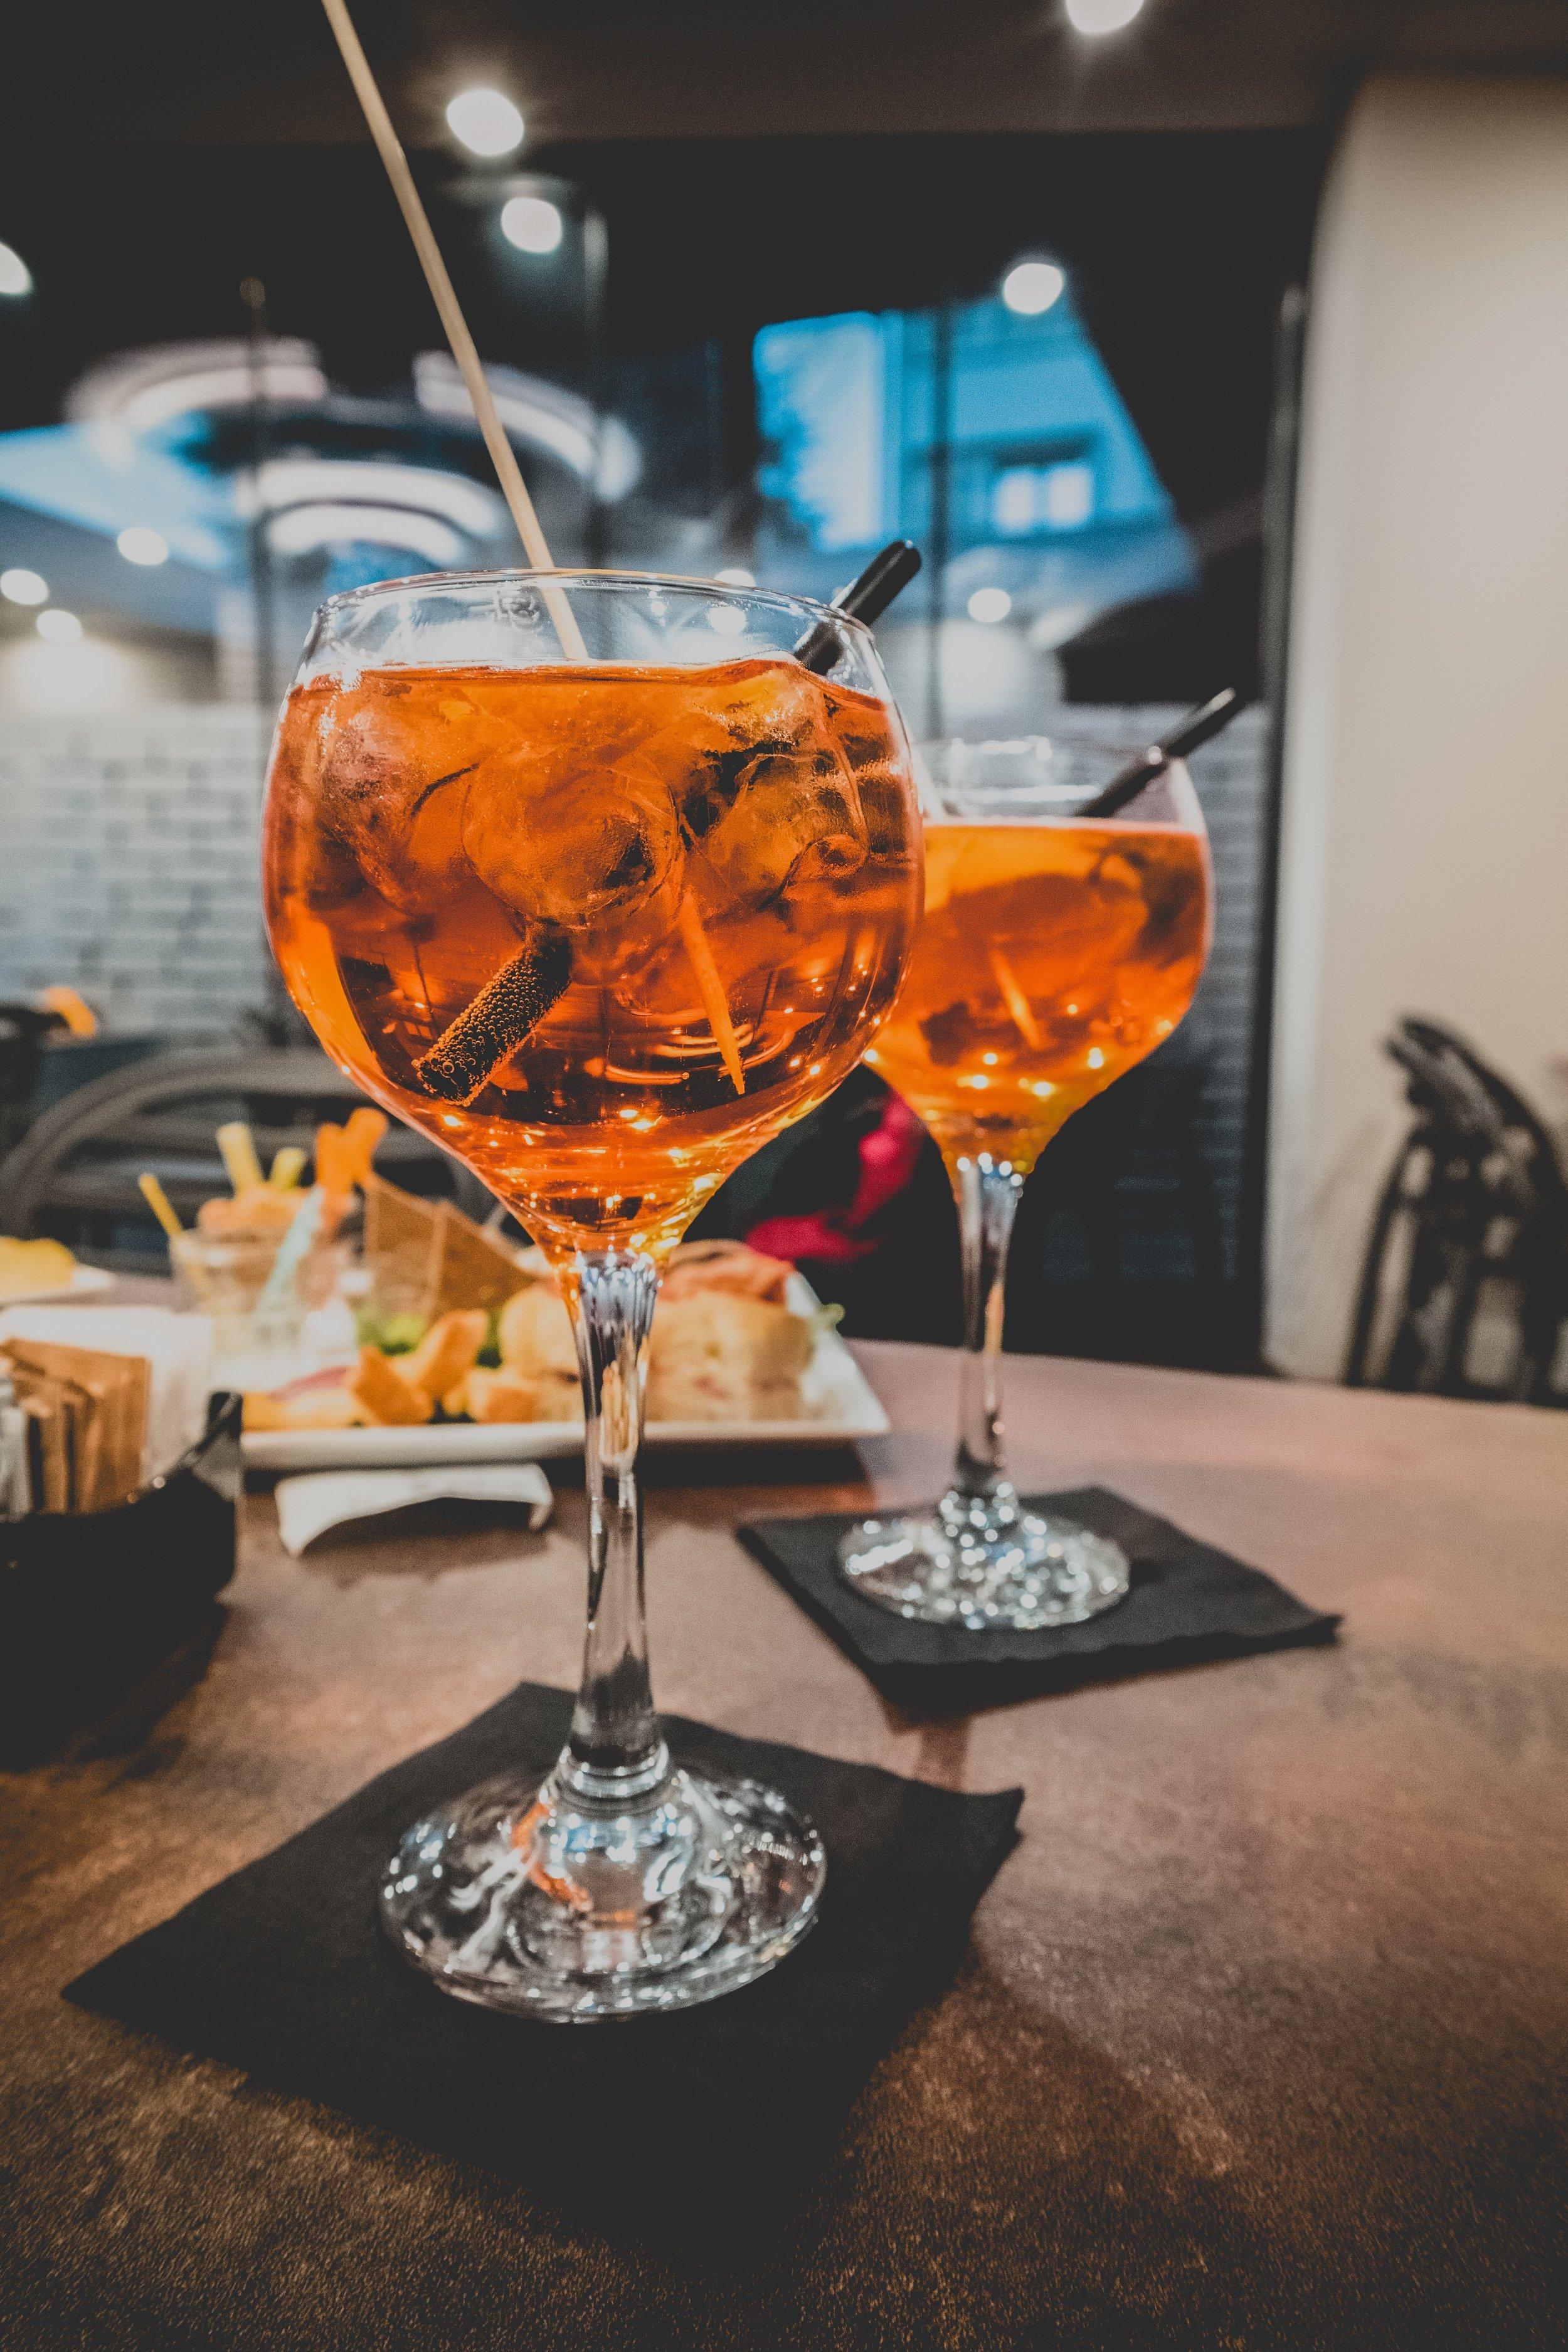 alcohol-bar-beverage-989703.jpg